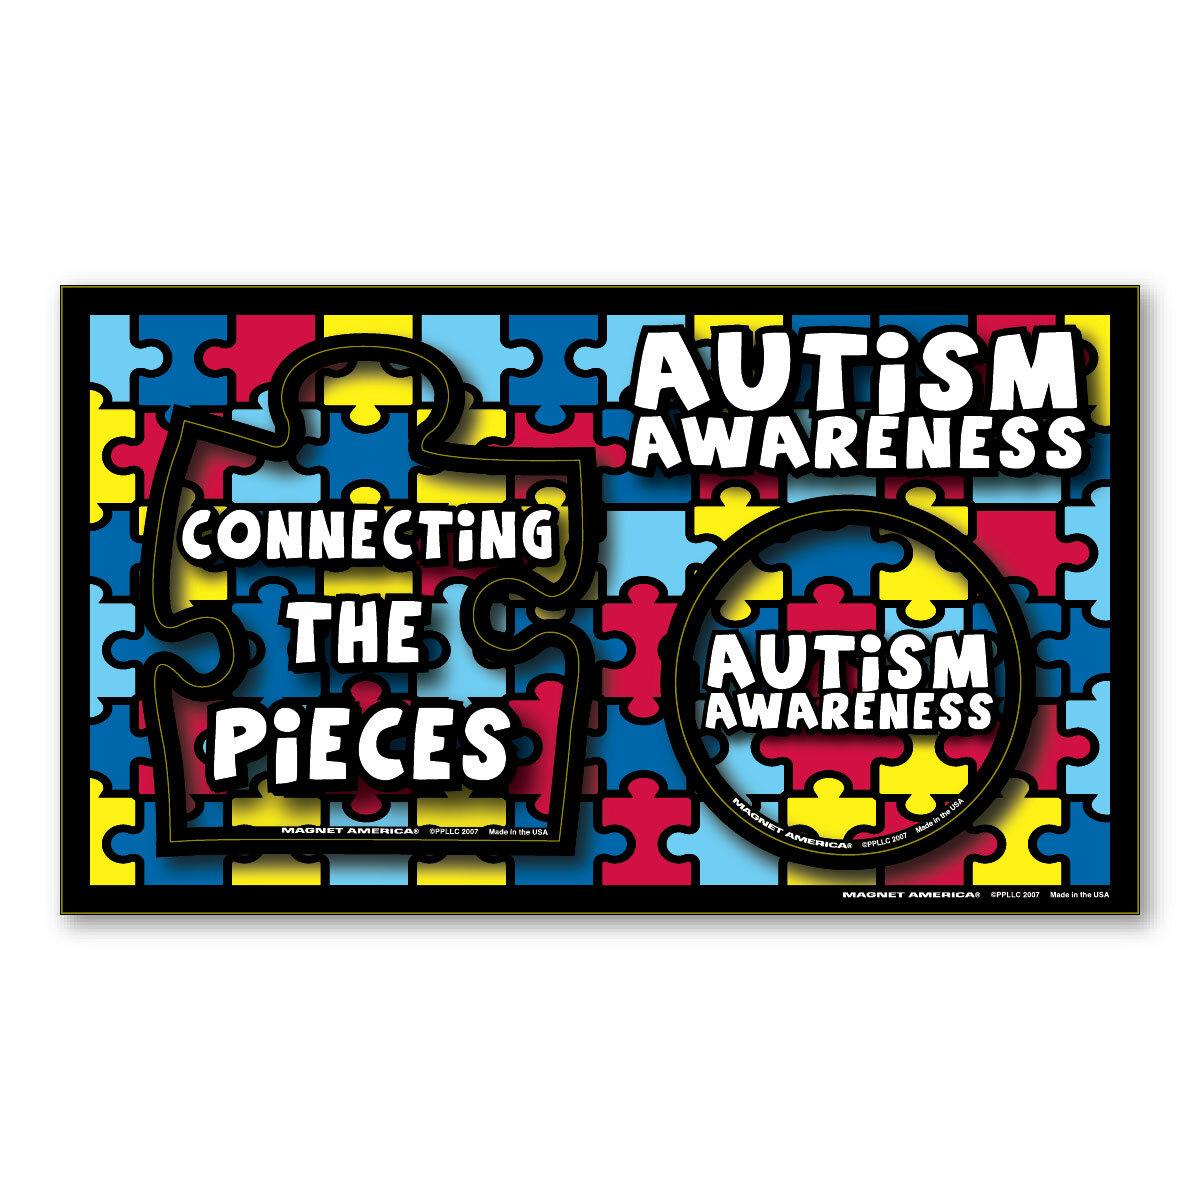 Magnet America Autism Awareness Magnet Picture Frame Wayfair